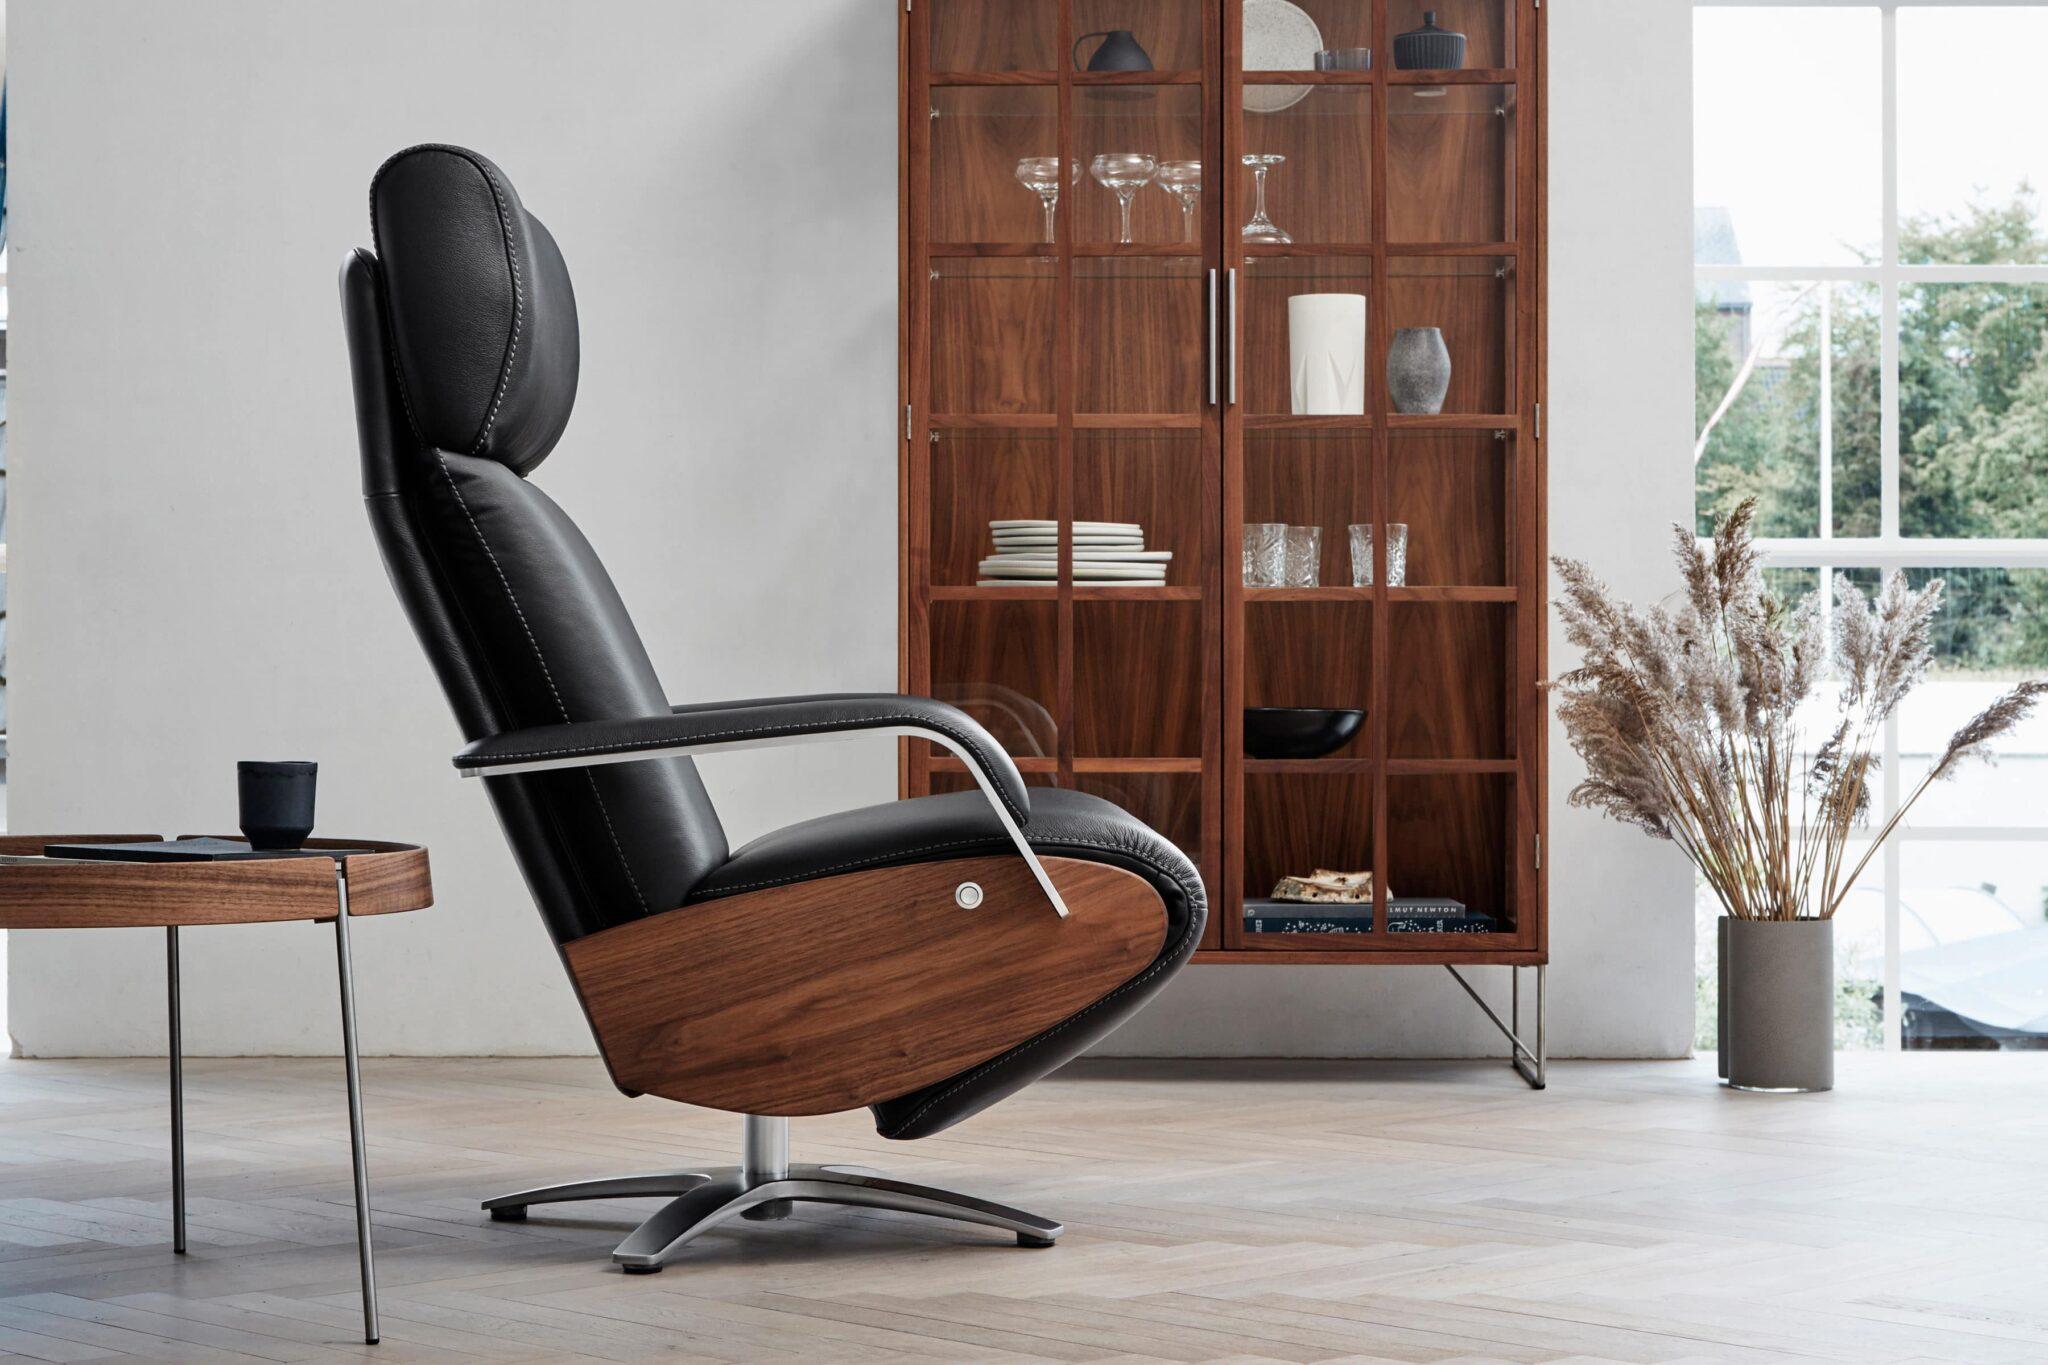 Hemelaer-Interior-Berg-Furniture-Berg Coda Relax 1-3600x2400-1